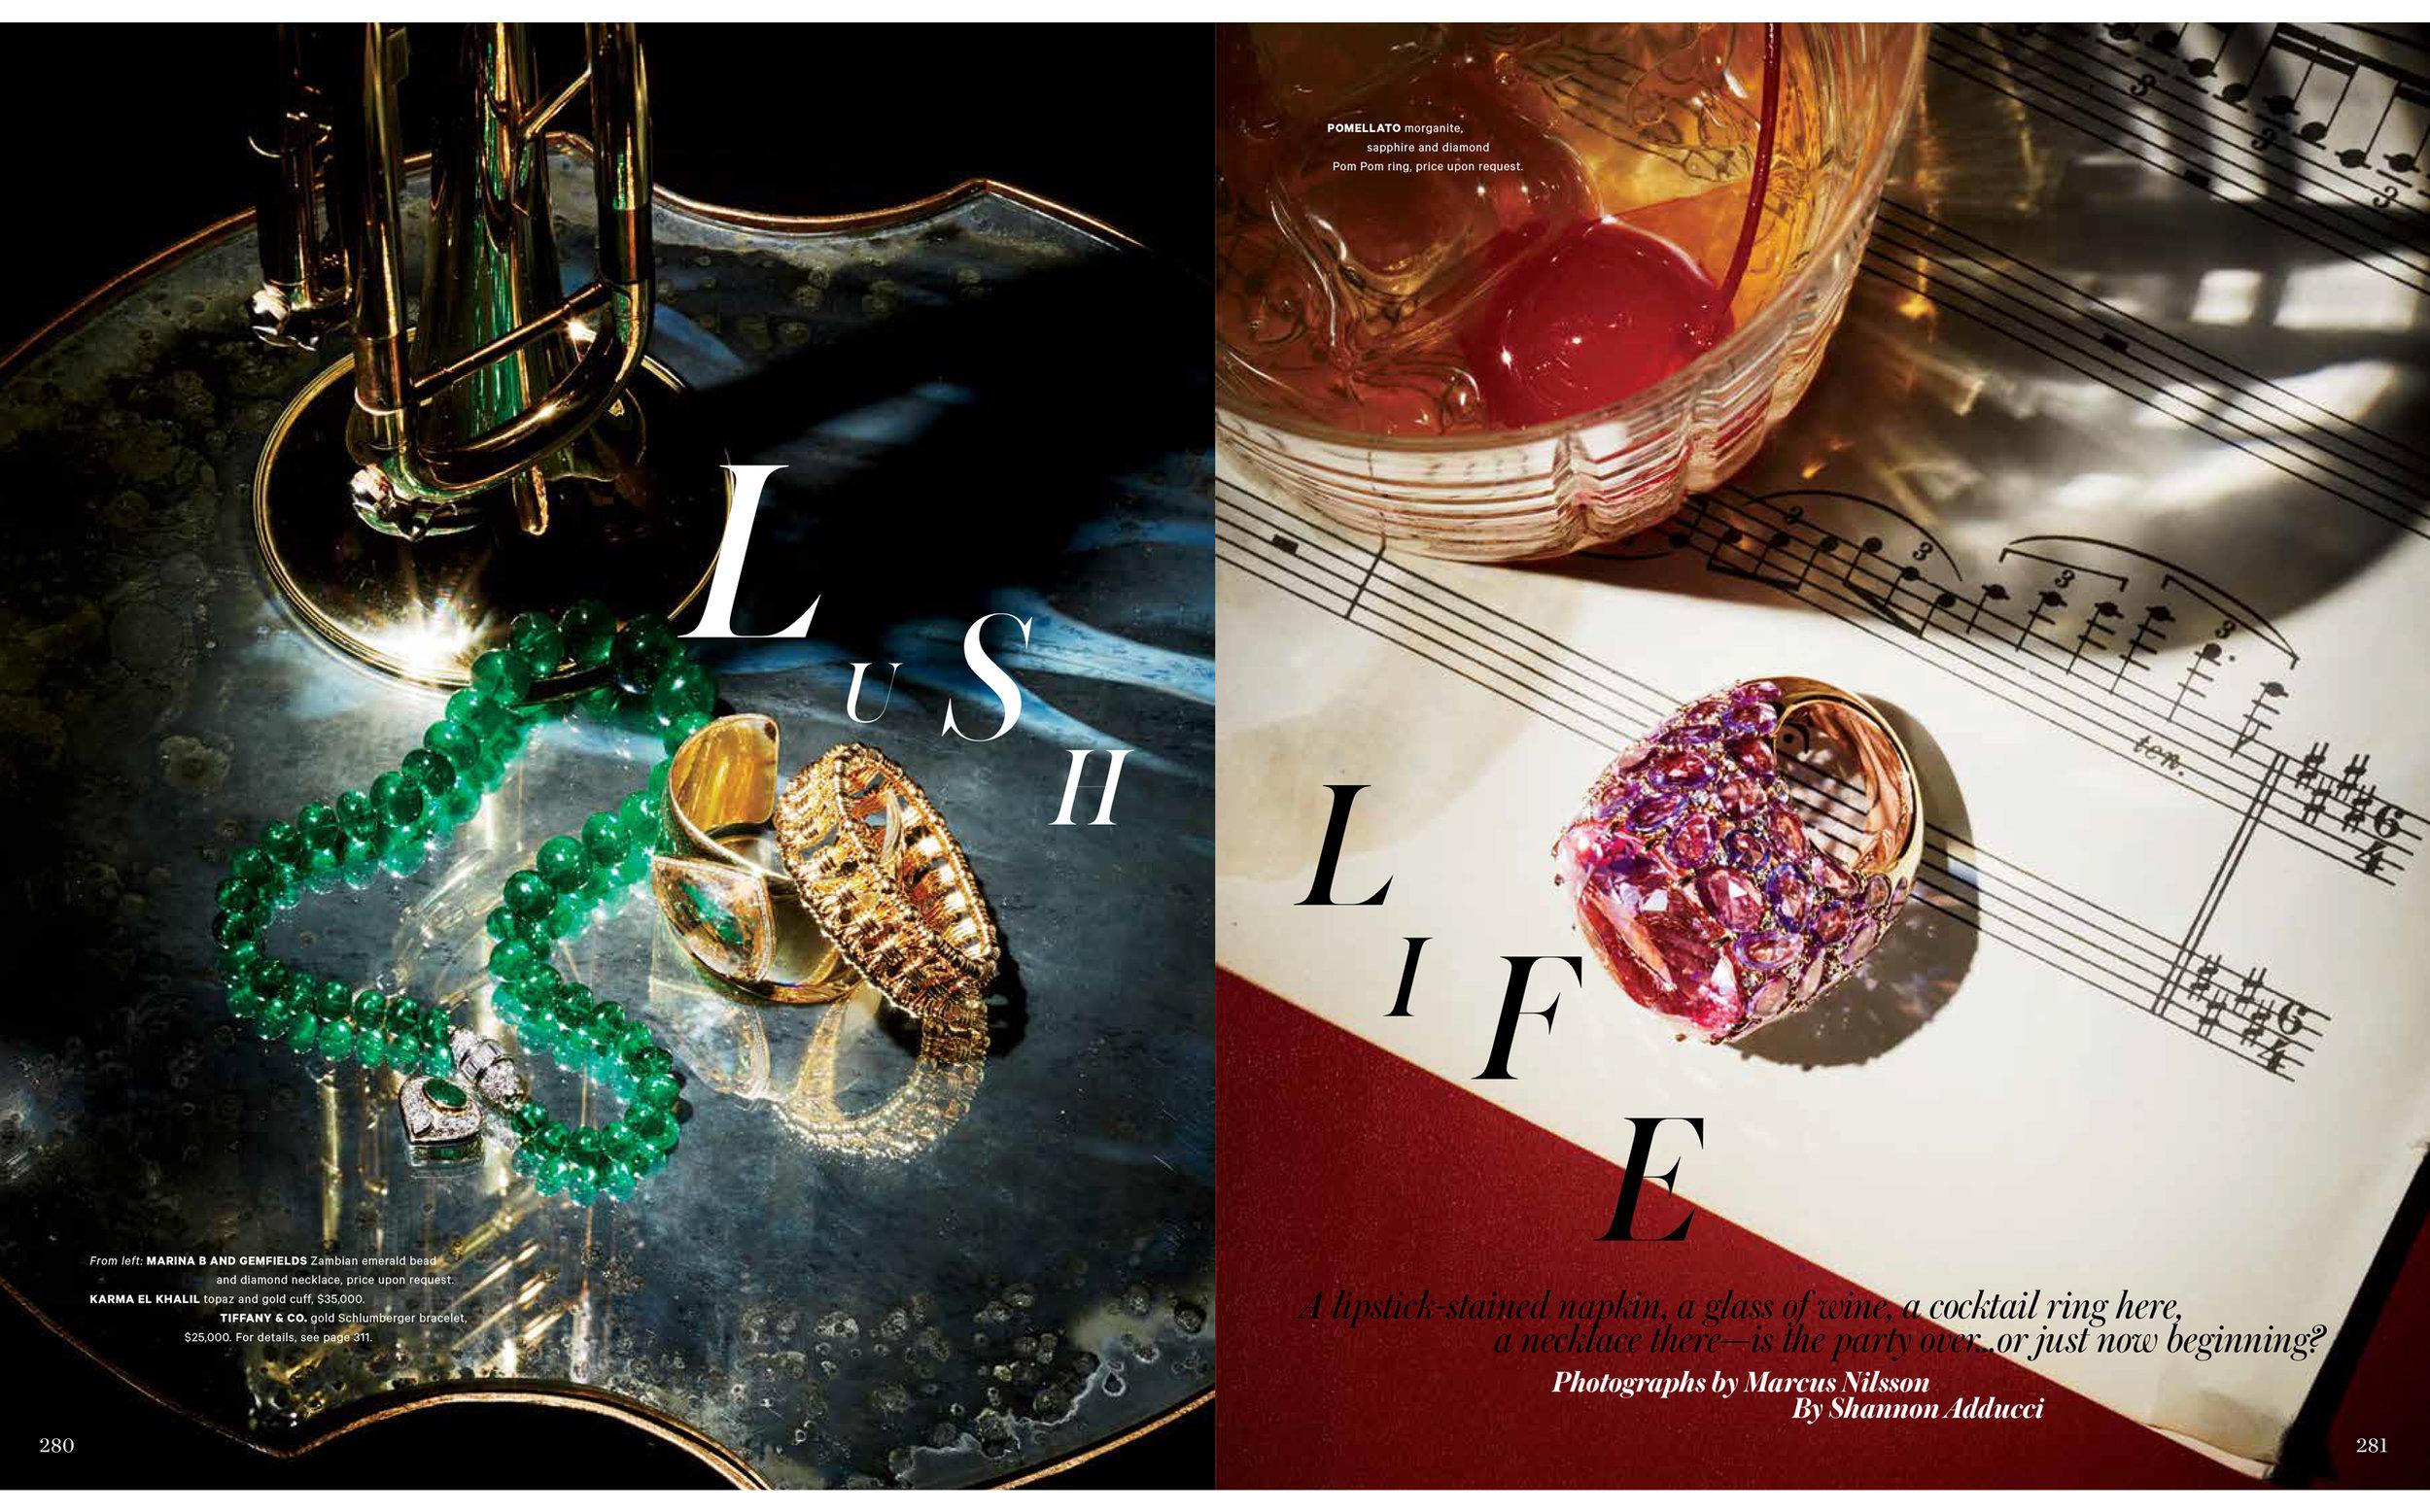 Lush-Life-Sept-2014-1.jpg